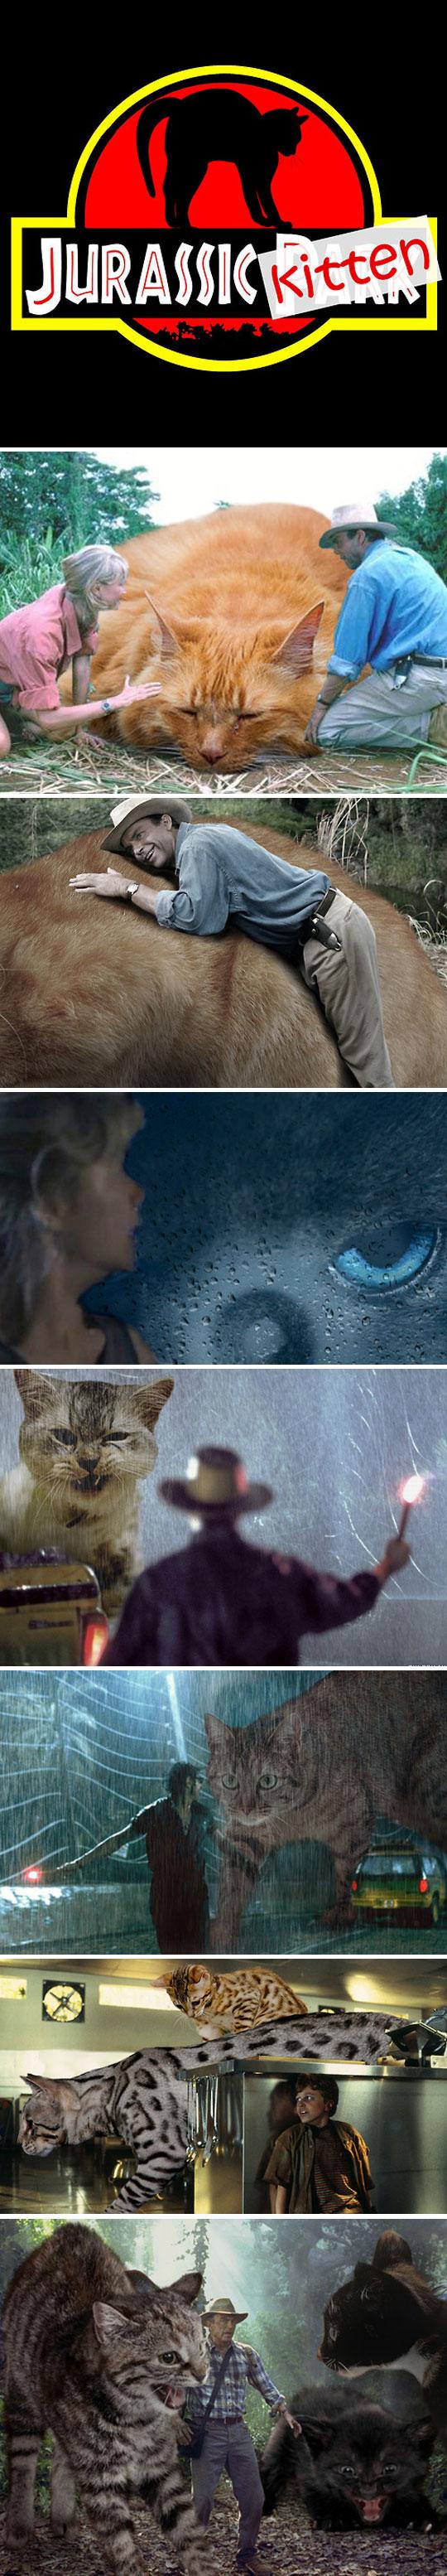 funny-Jurassic-Kitten-photoshopped-dinosaurs